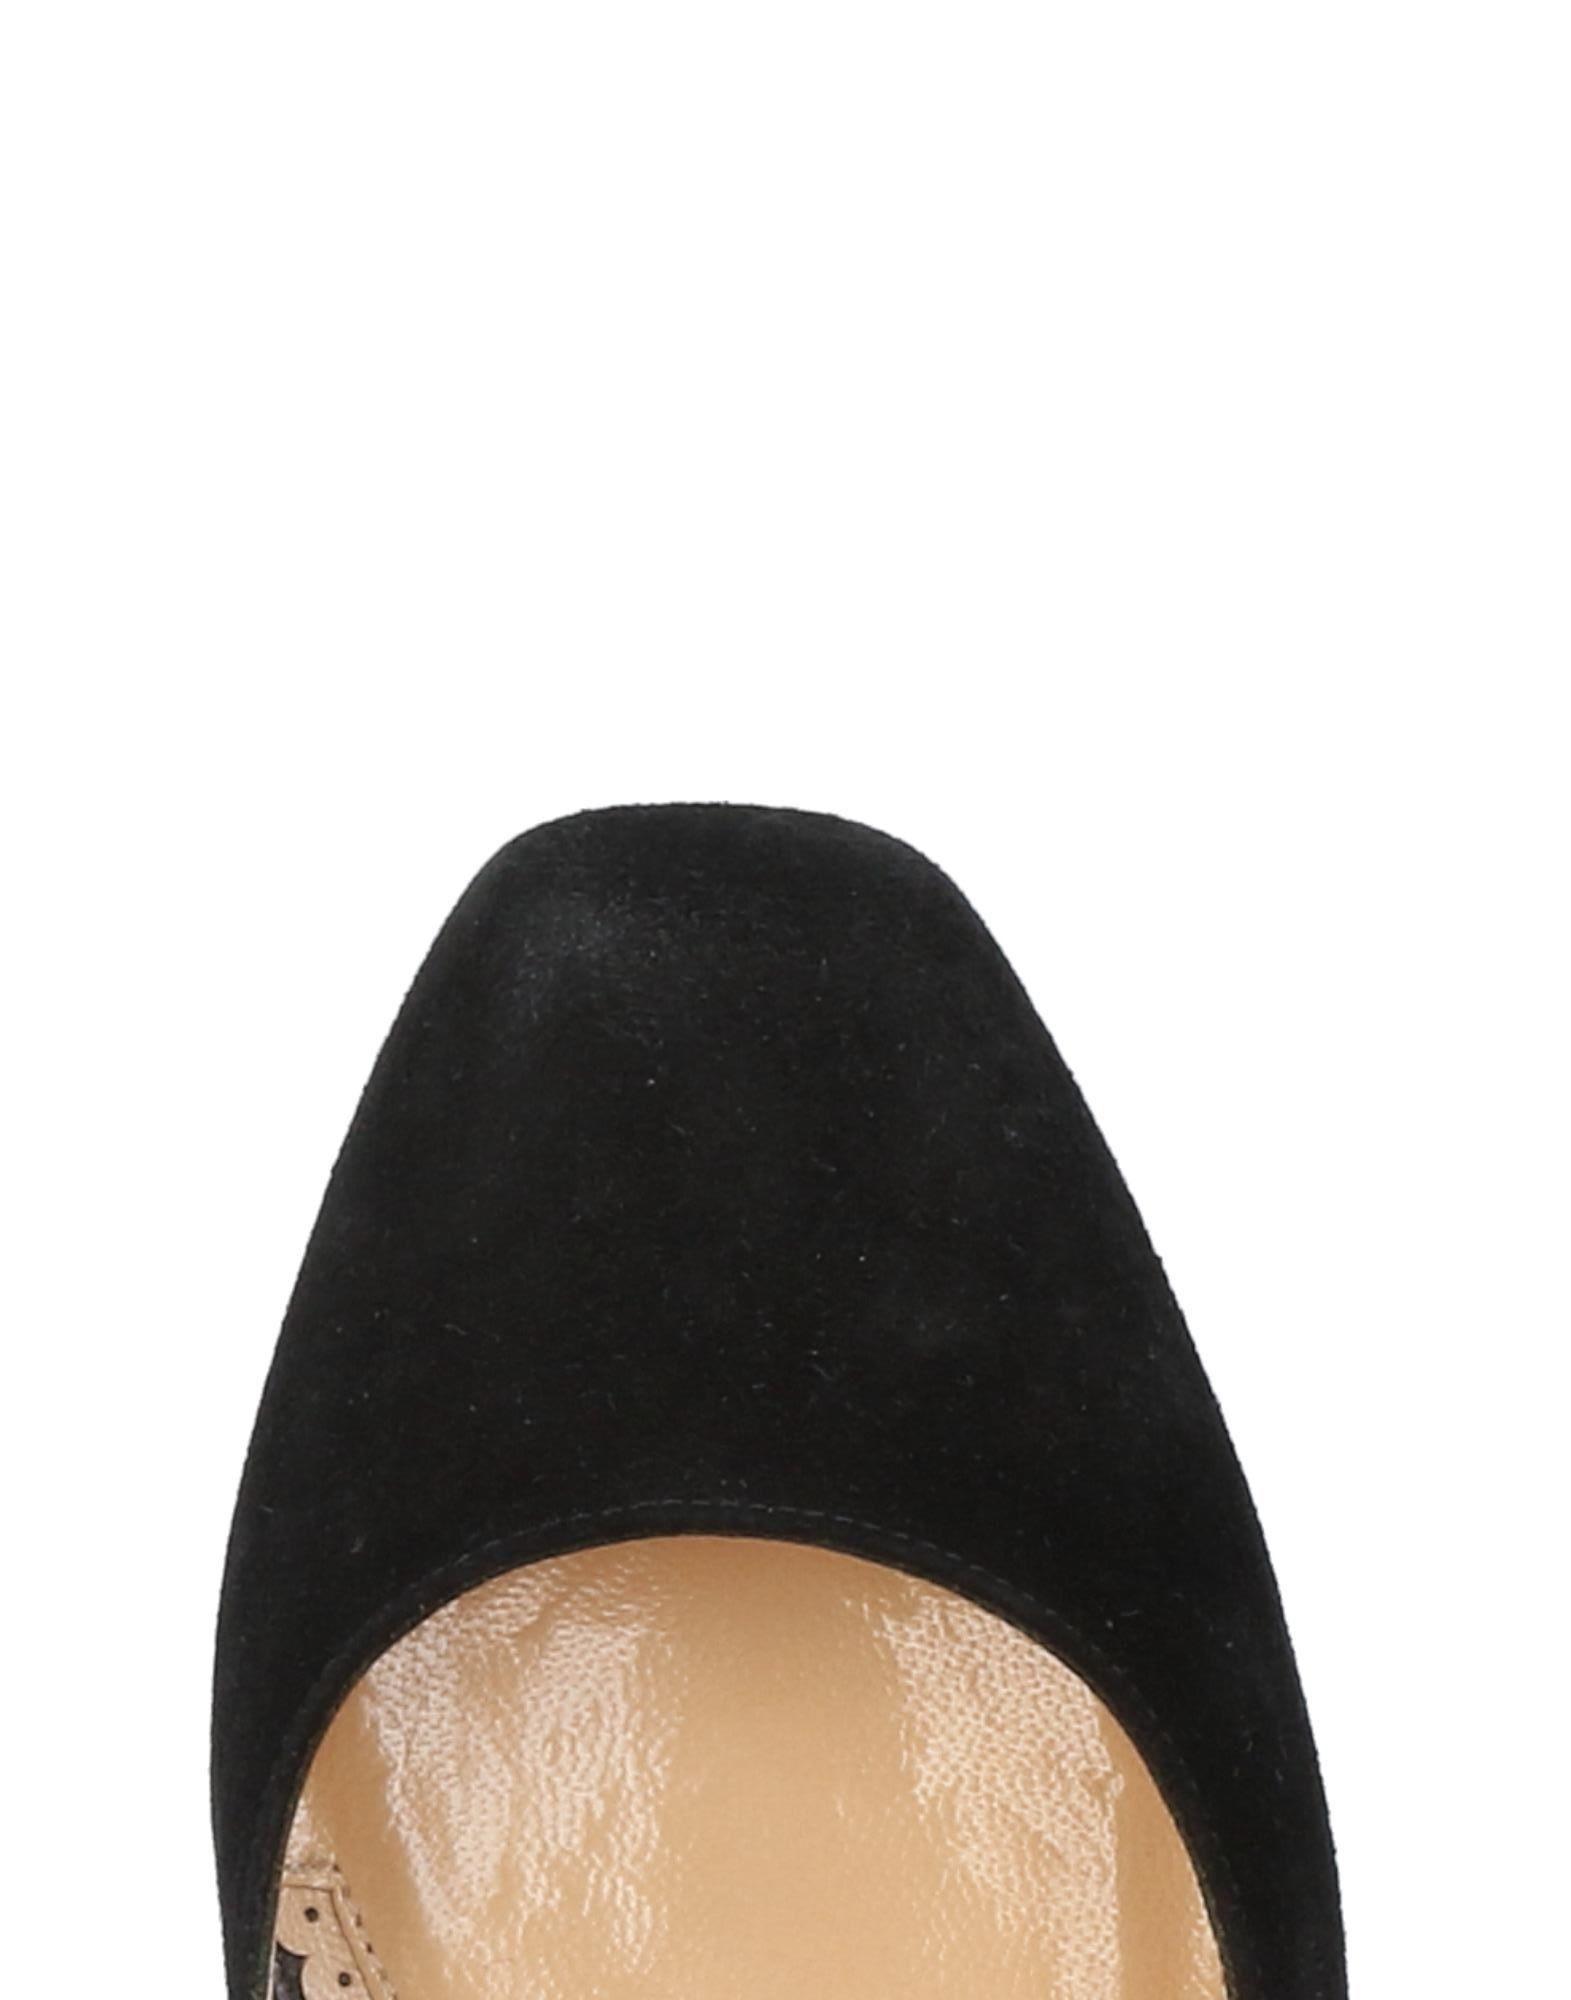 Charlotte Olympia Pumps Damen Damen Pumps  11491822US Beliebte Schuhe f002e6